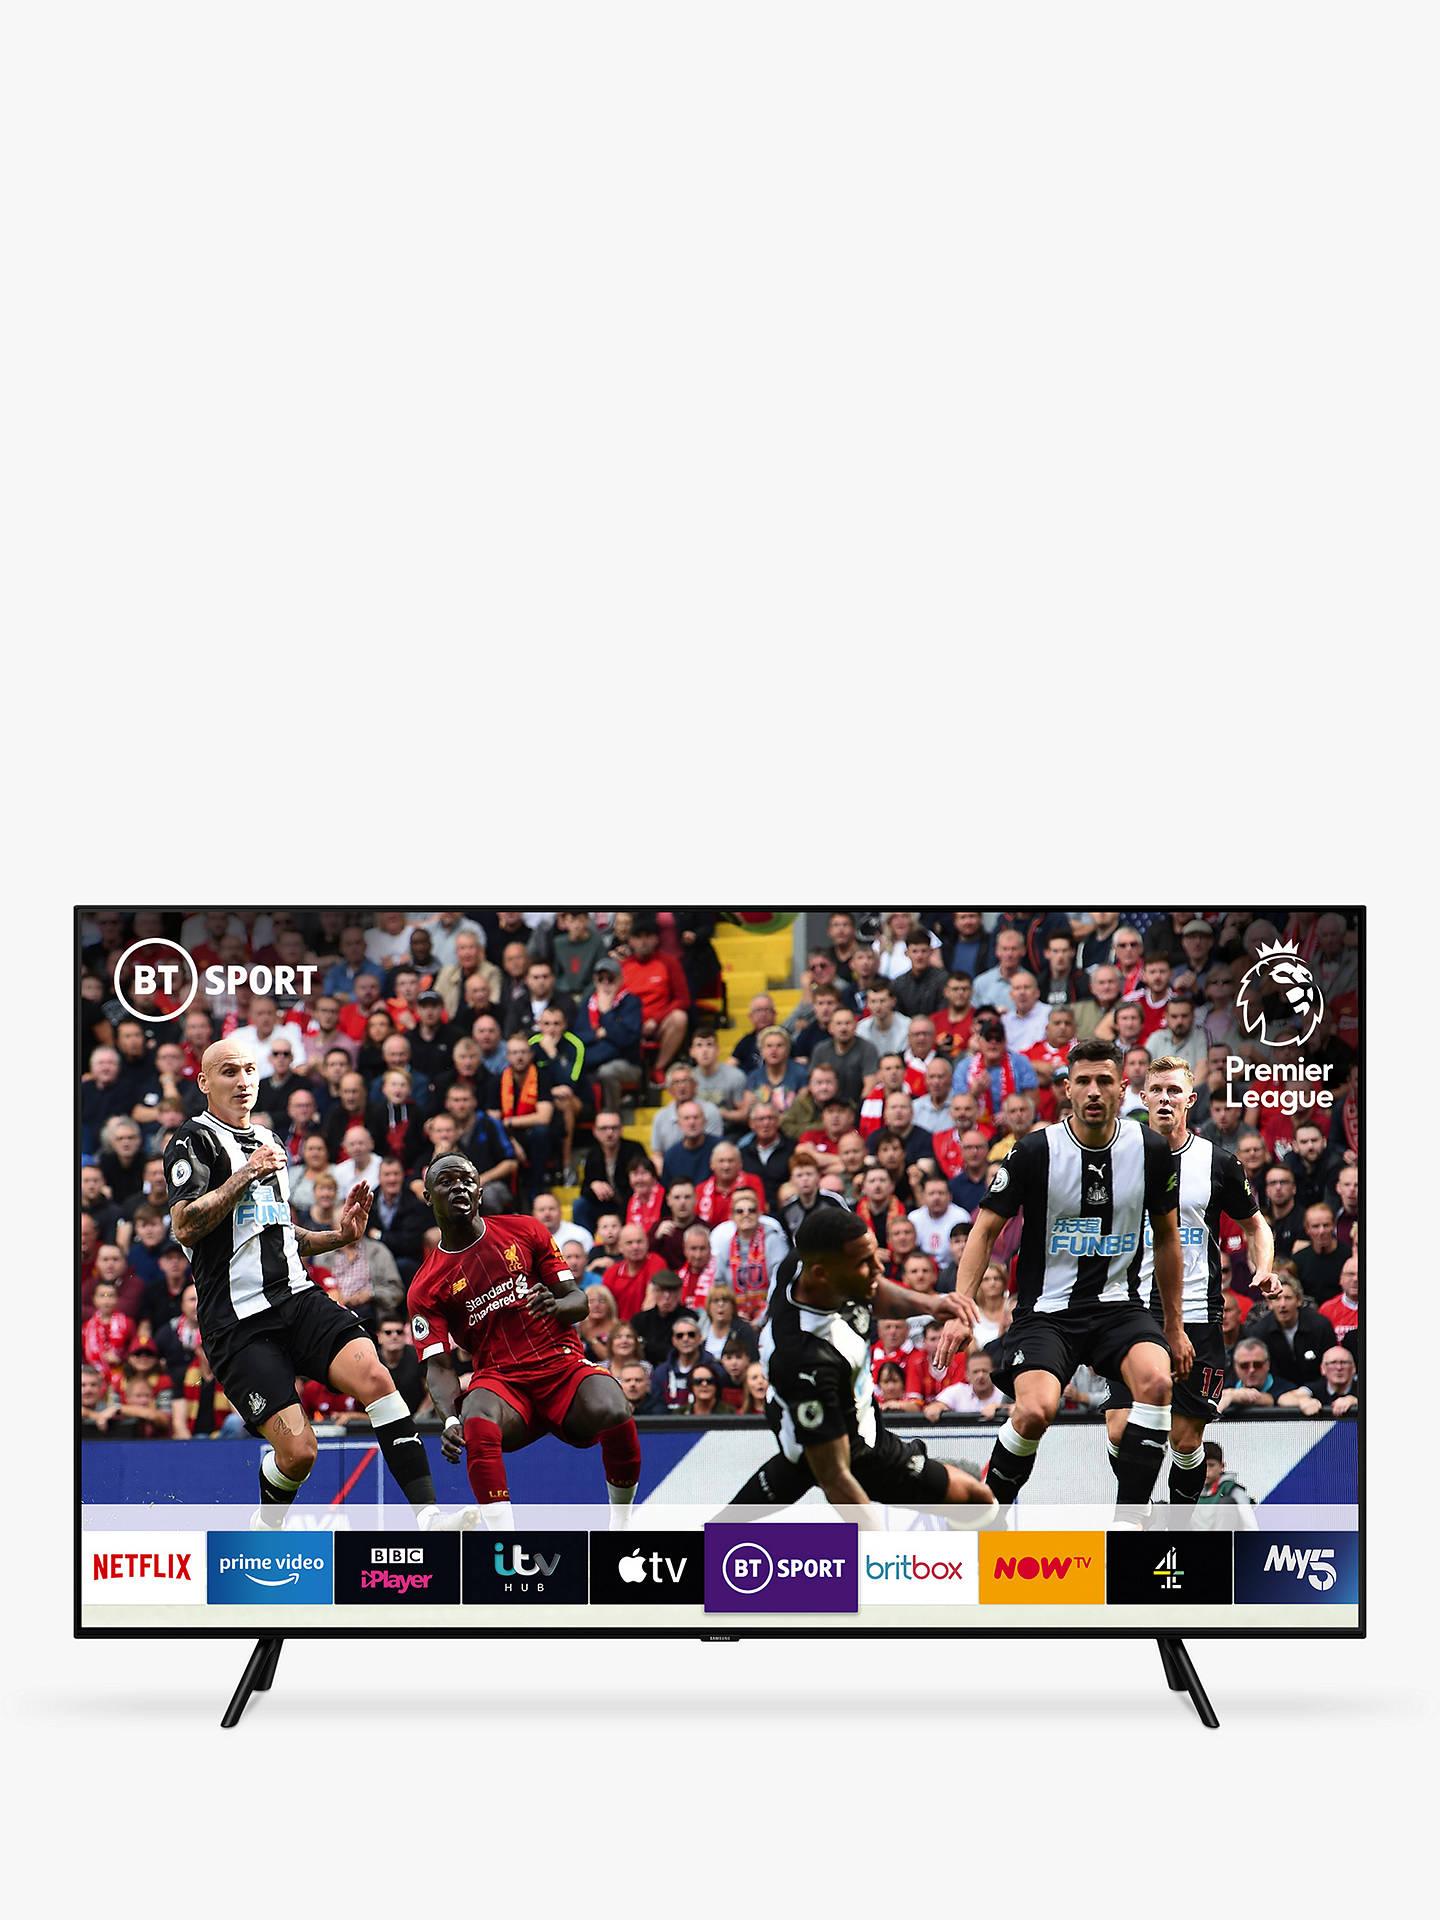 "Samsung Qe55 Q70 R (2019) Qled Hdr 1000 4 K Ultra Hd Smart Tv, 55"" With Tv Plus/Freesat Hd & Apple Tv App, Slate Black by Samsung"